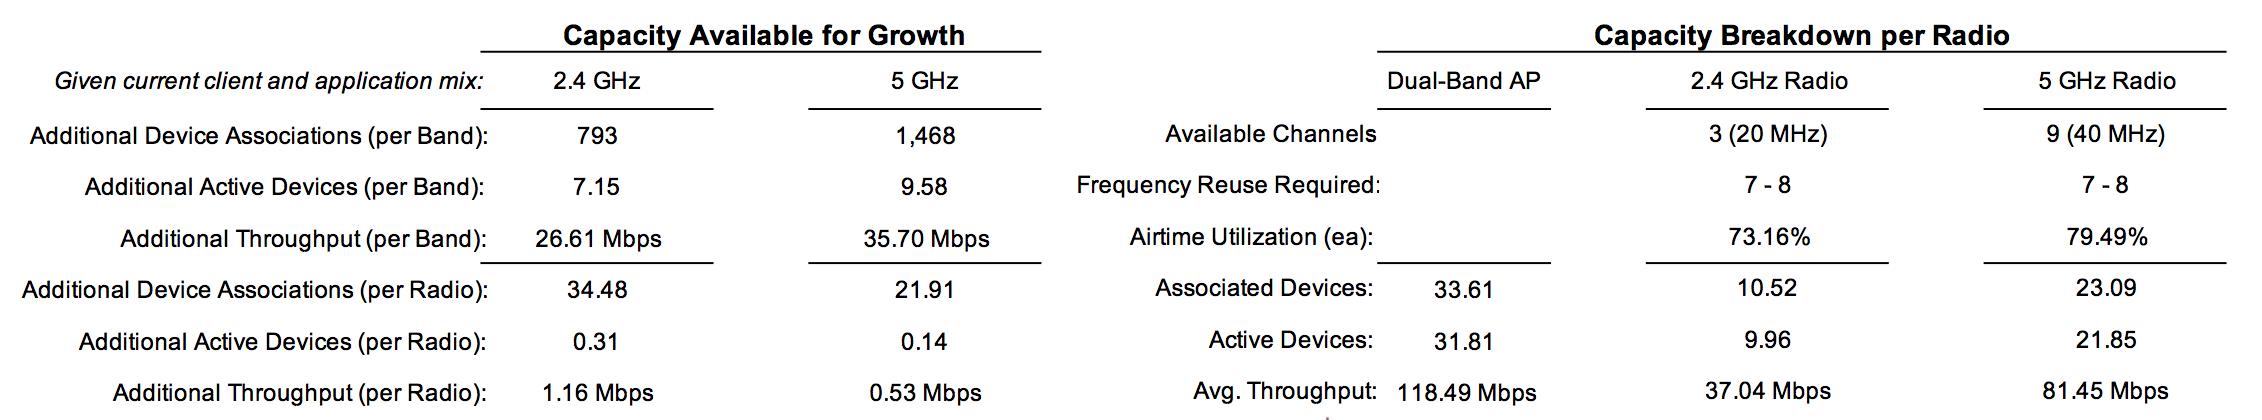 Capacity breakdown per-radio and future growth analysis